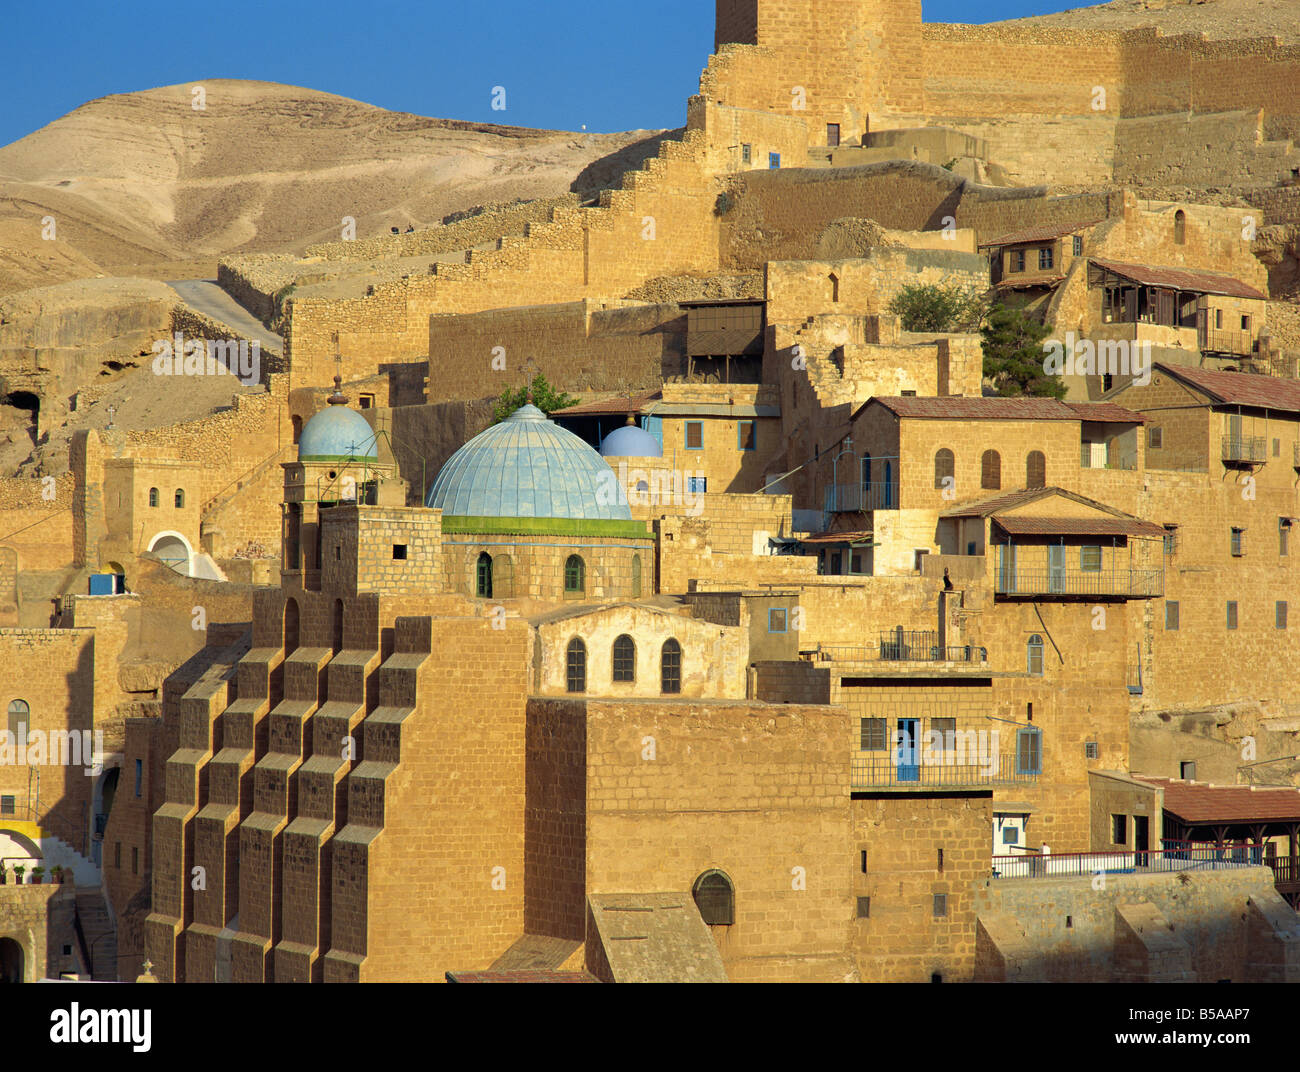 Buildings at the Mar Saba Orthodox Monastery near Bethlehem, in the Judean Desert, Israel, Middle East - Stock Image